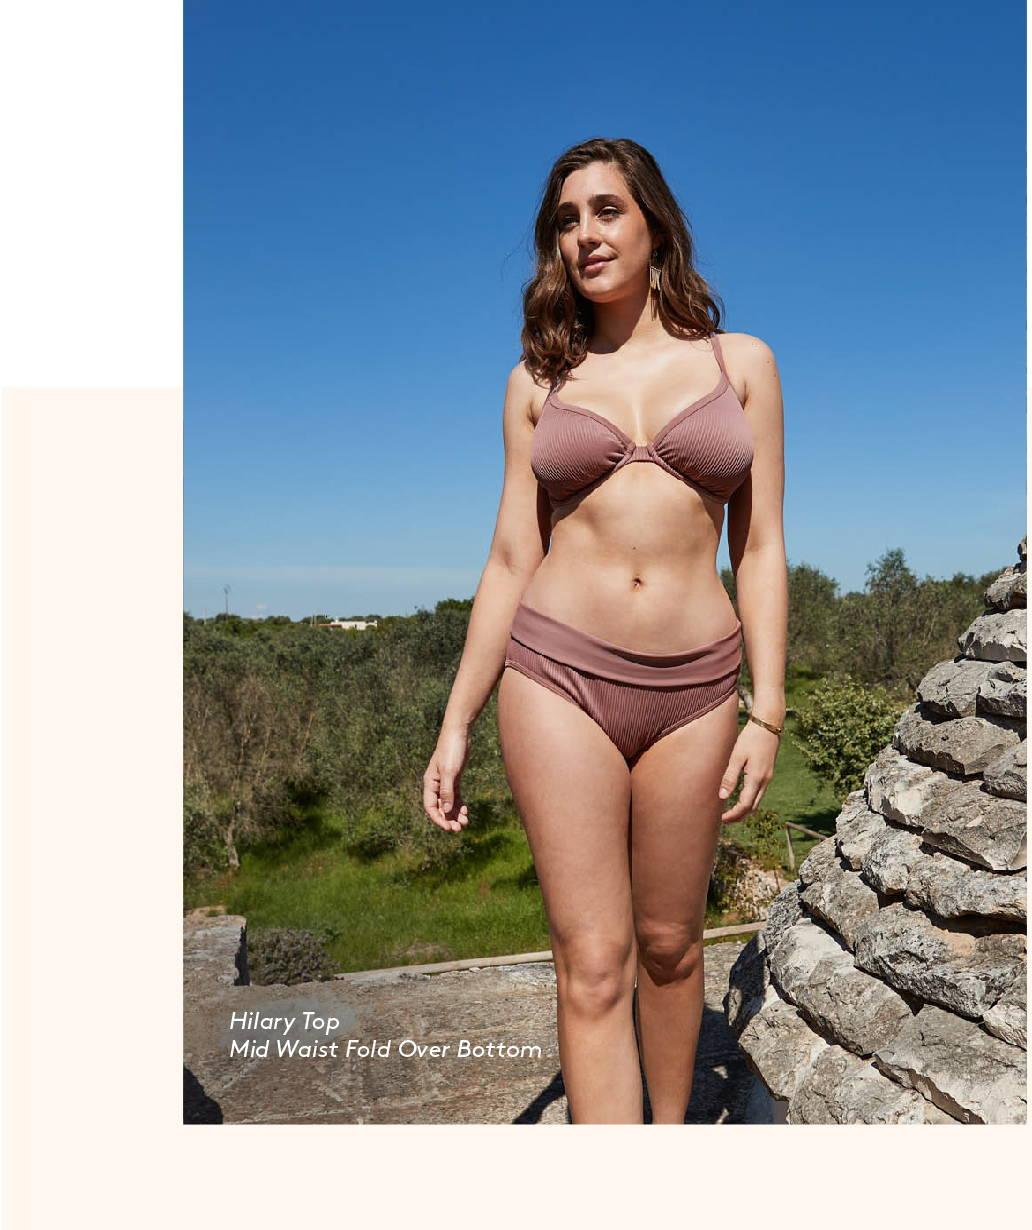 Shop SKYE's Riviera print!